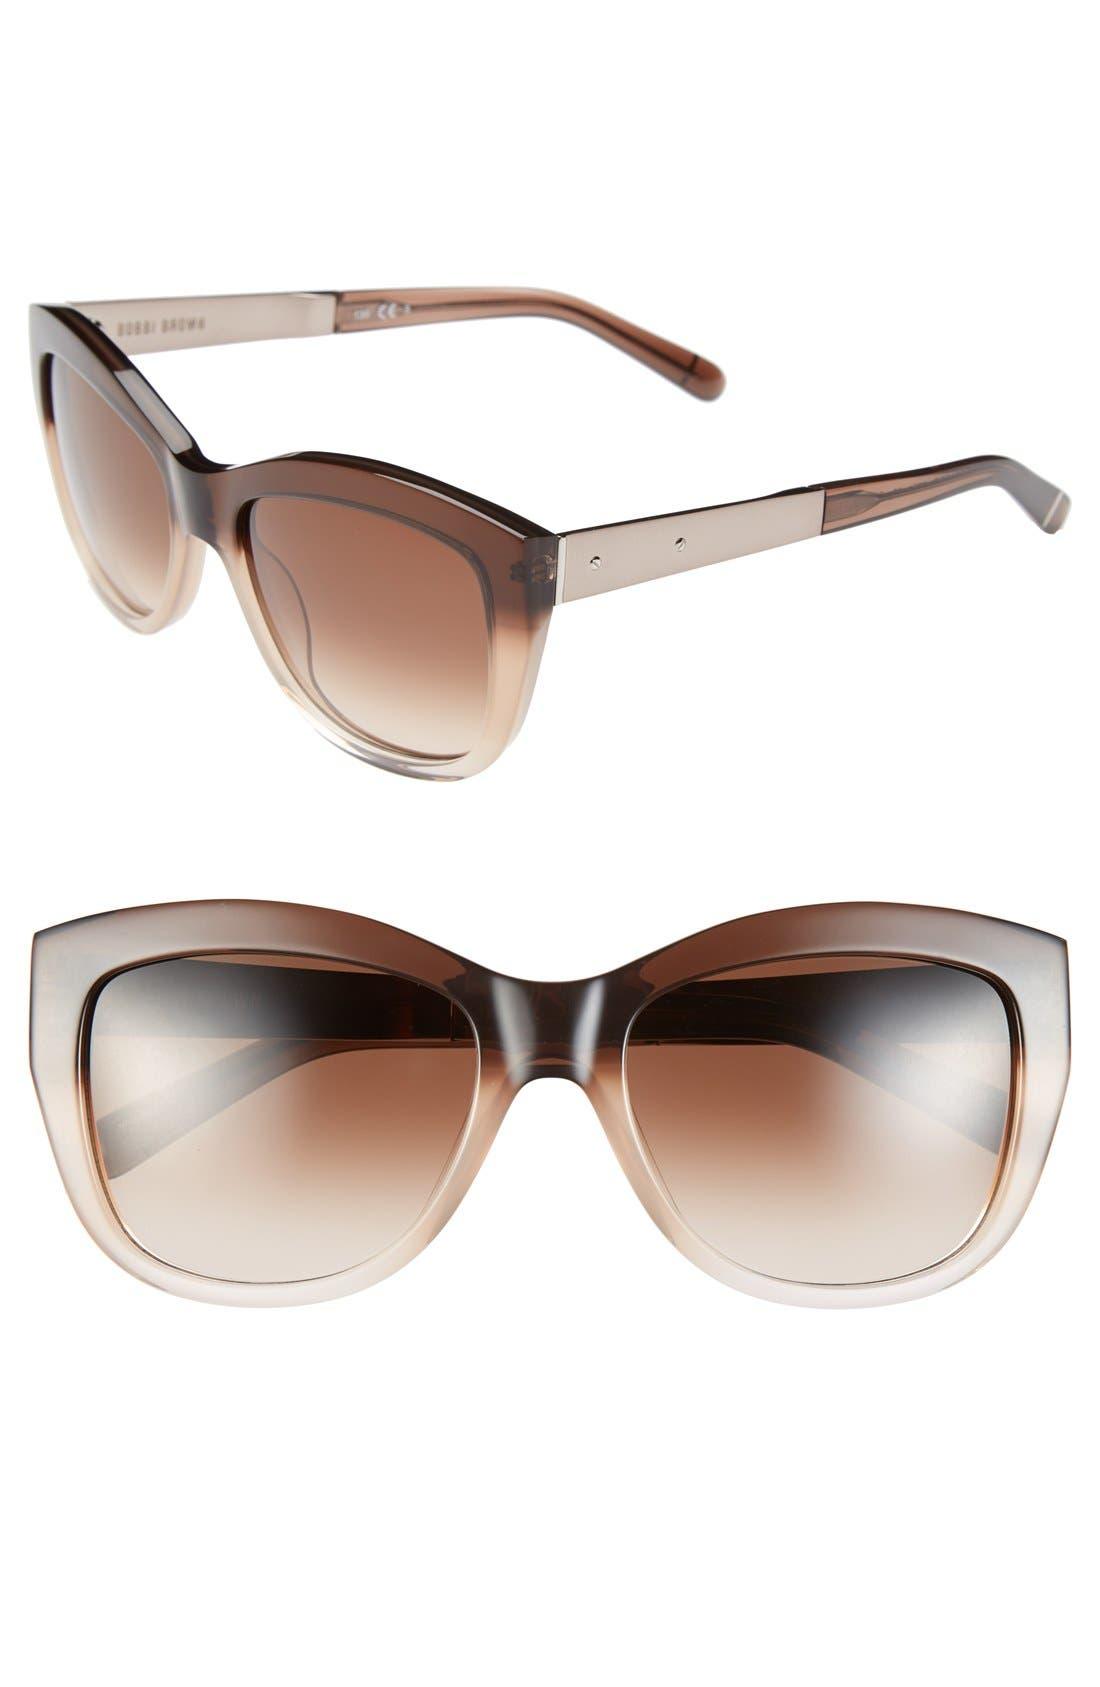 Alternate Image 1 Selected - Bobbi Brown 'The Graces' 54mm Cat Eye Sunglasses